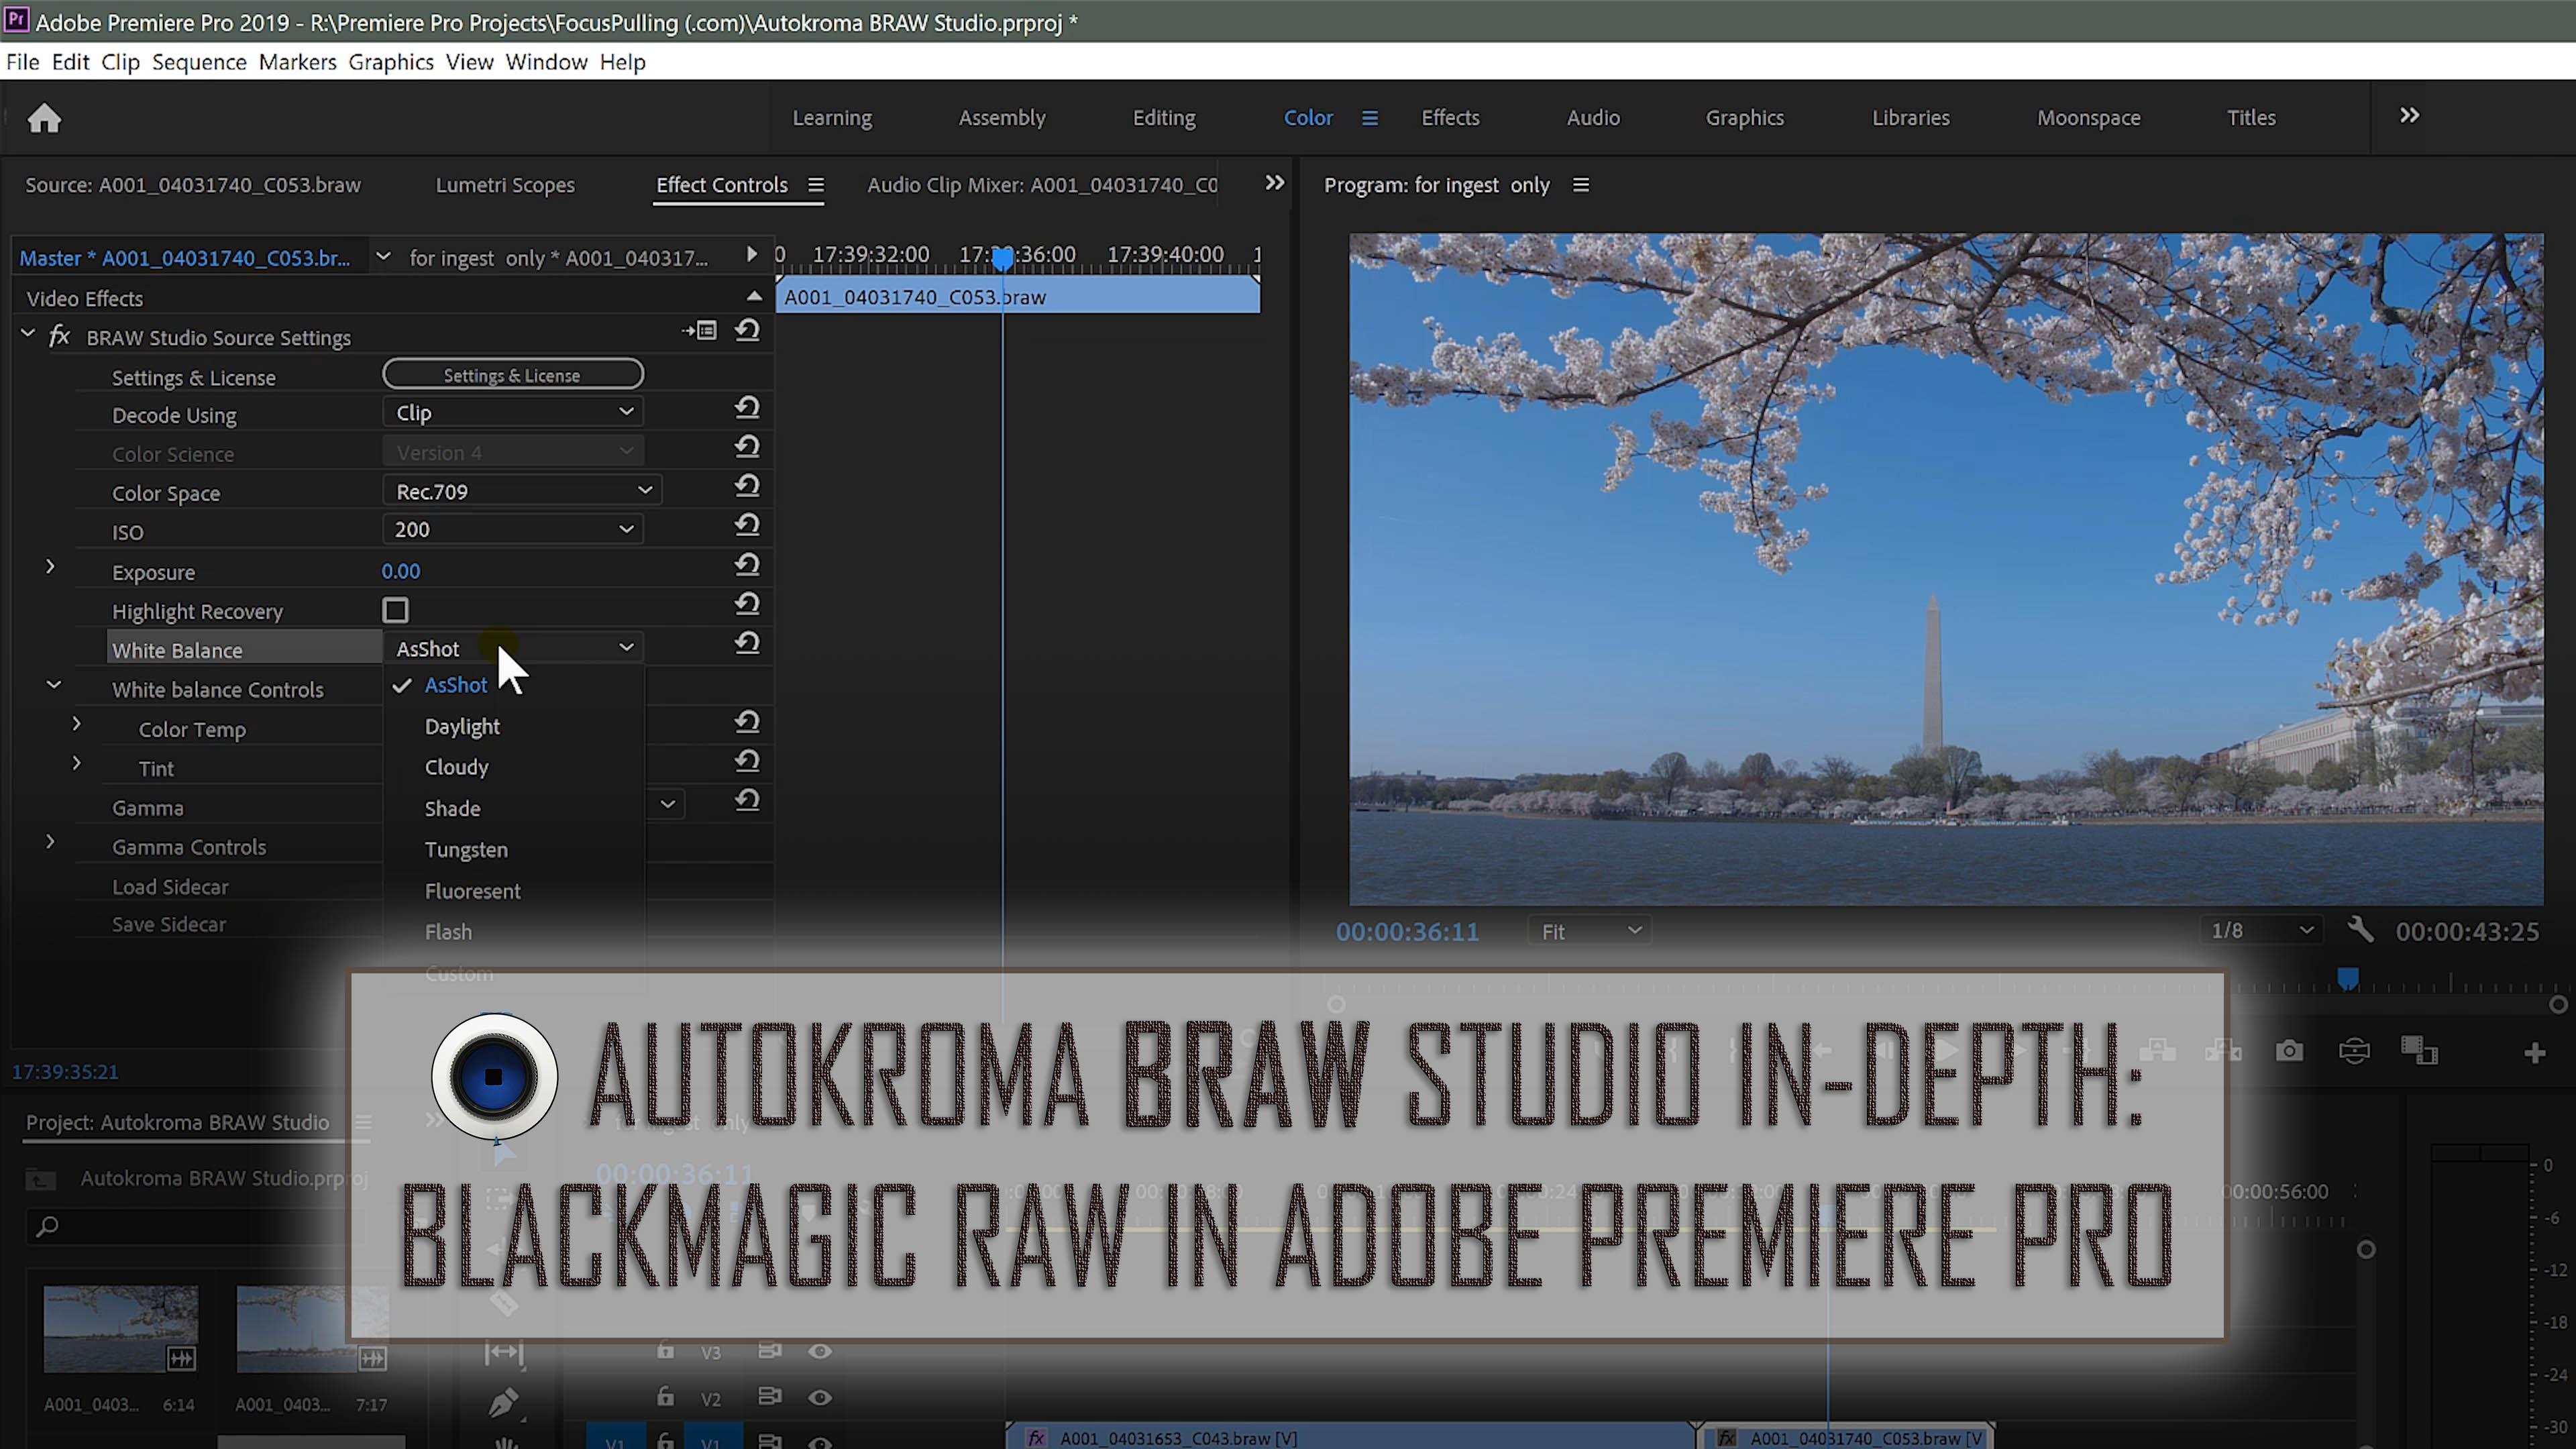 BRAW Studio In-Depth: Using Blackmagic RAW in Adobe Premiere